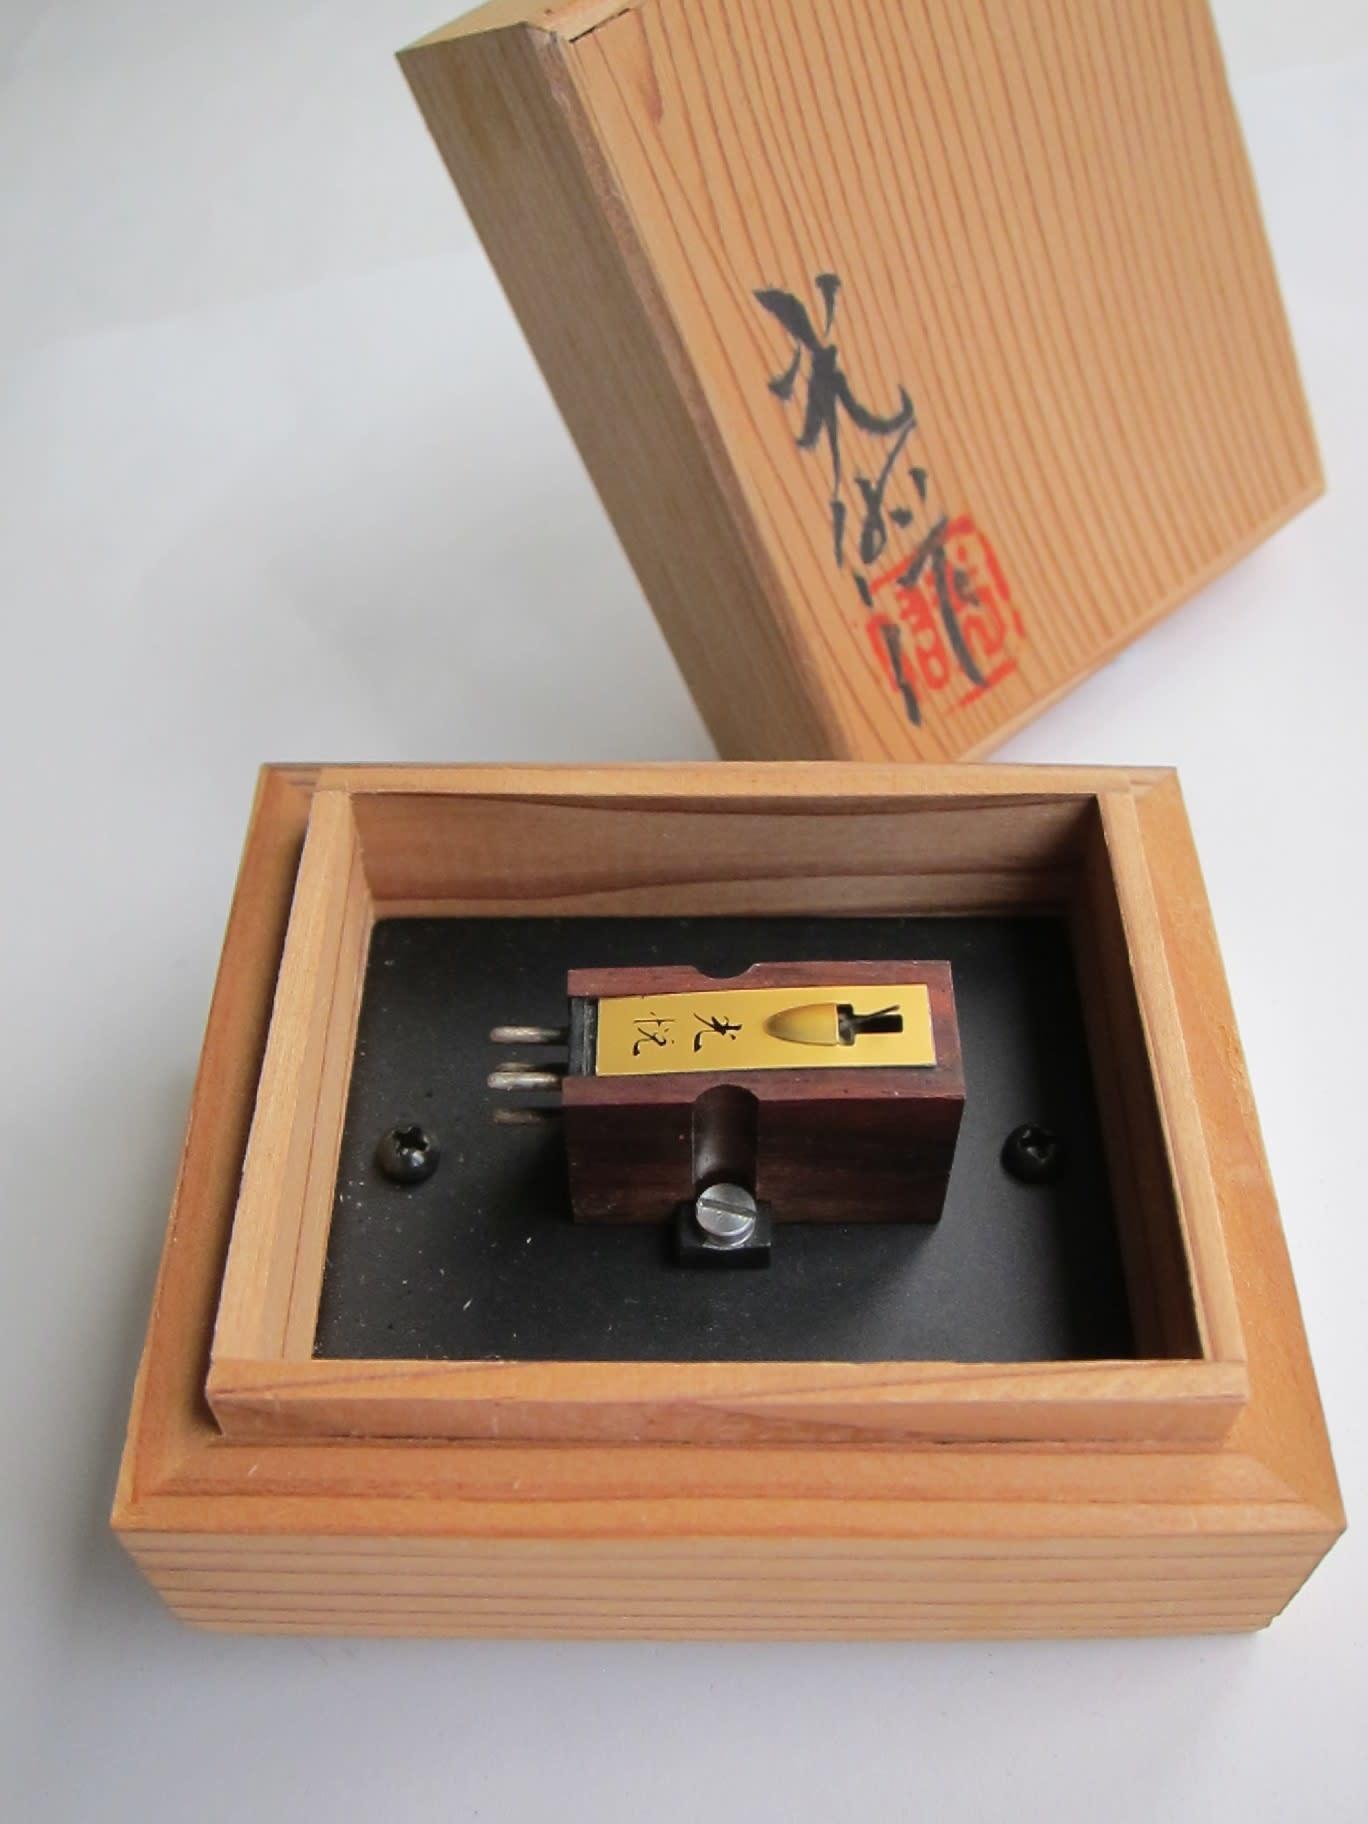 Koetsu Rosewood Moving Coil Cartridge